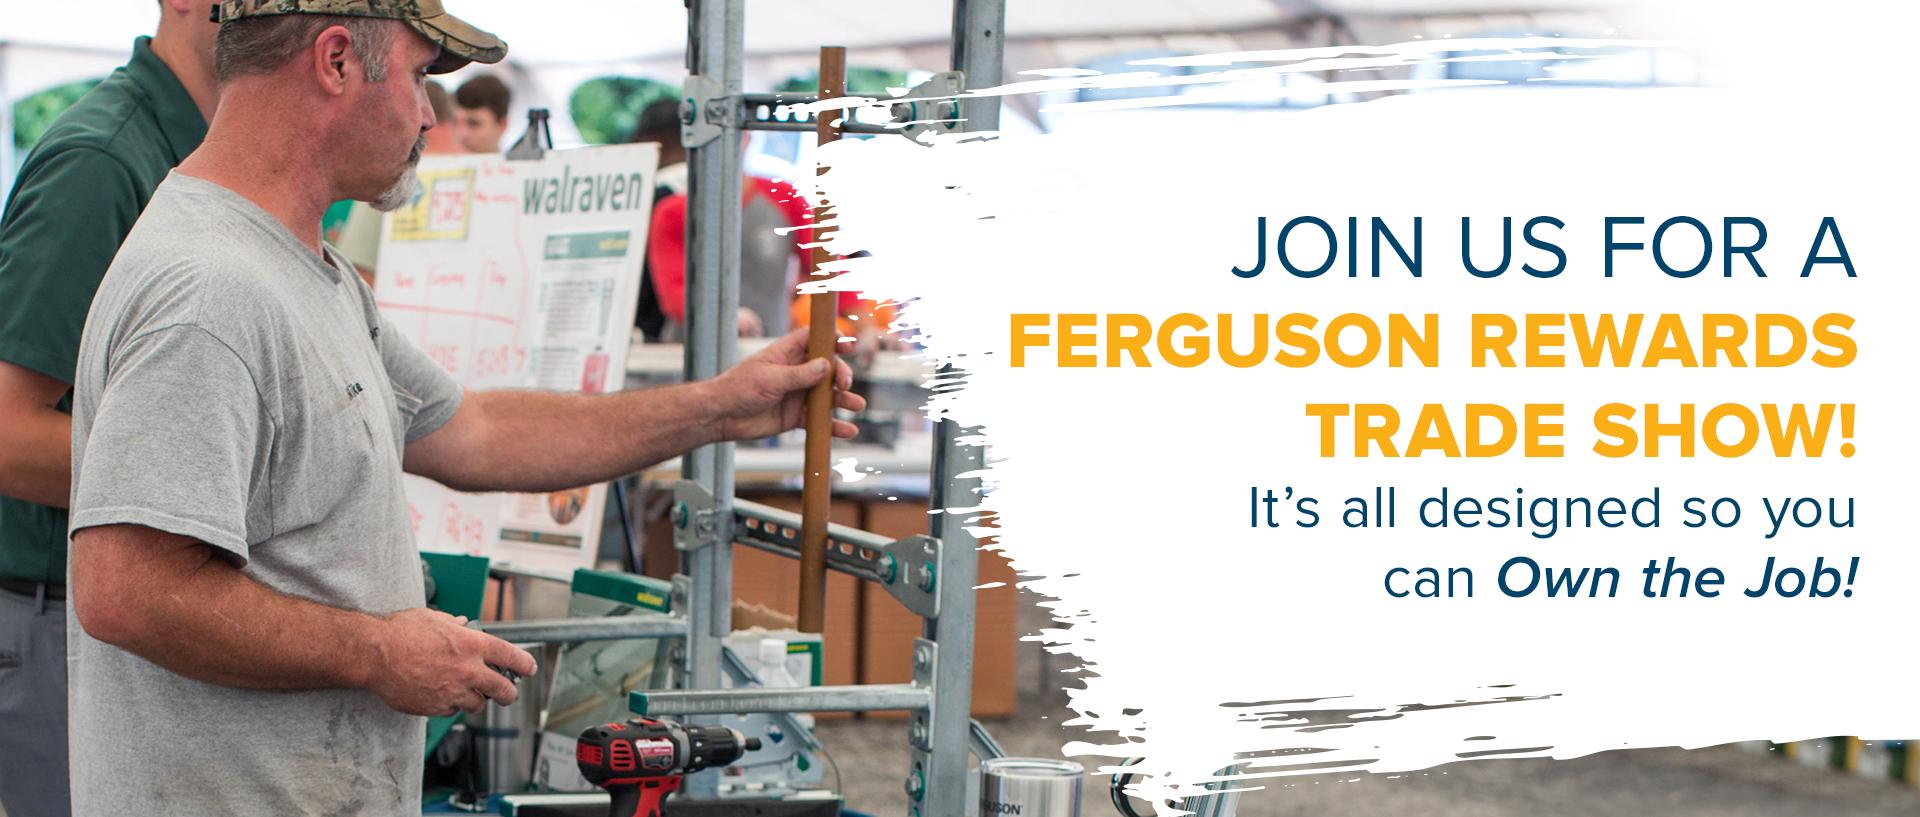 Ferguson Rewards